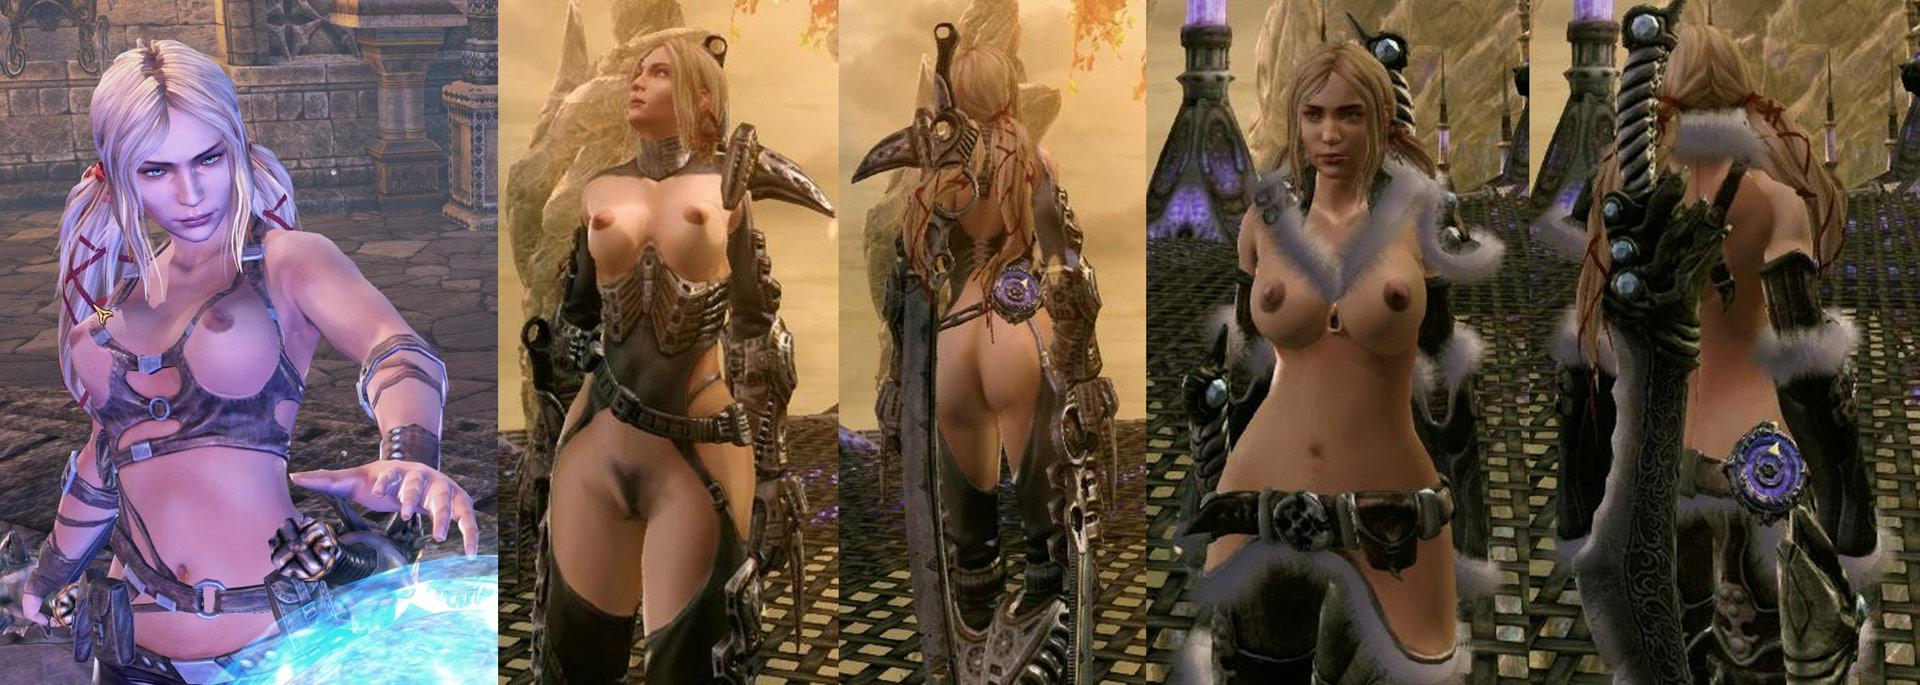 italy girl sexy fuck